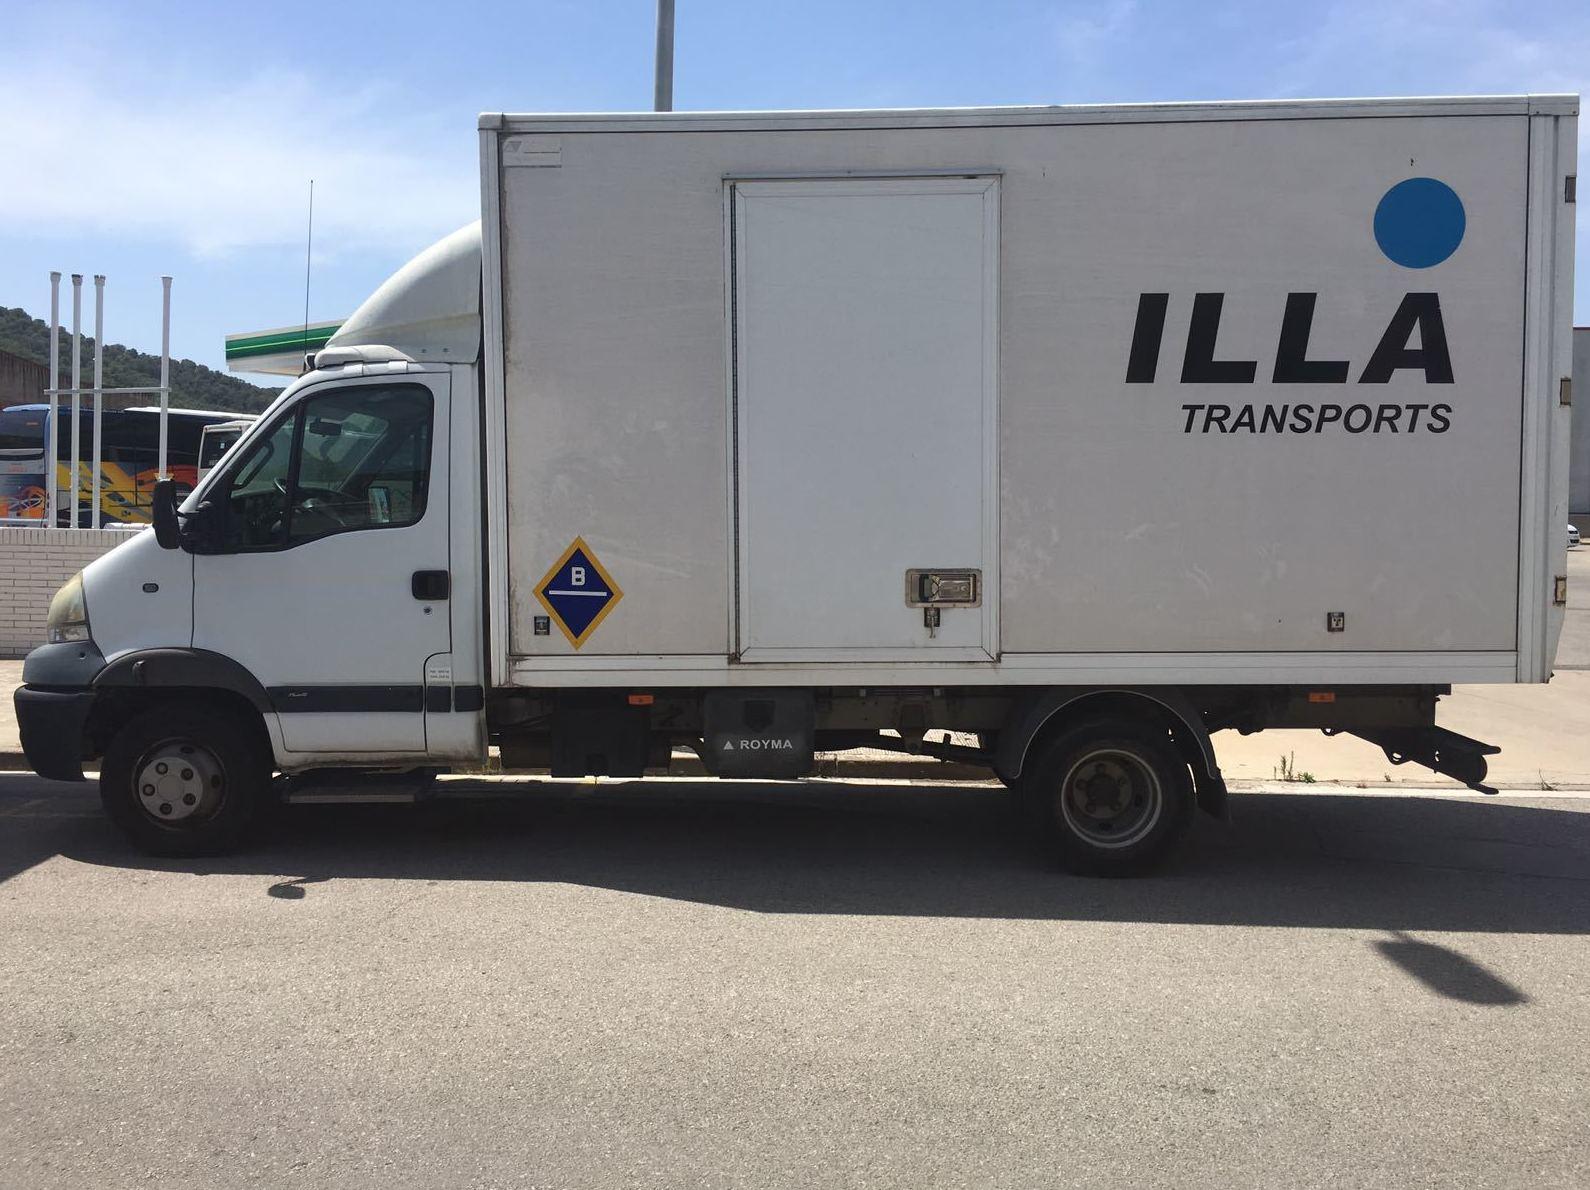 Foto 13 de Mensajería en Sant Celoni | Illa Transports